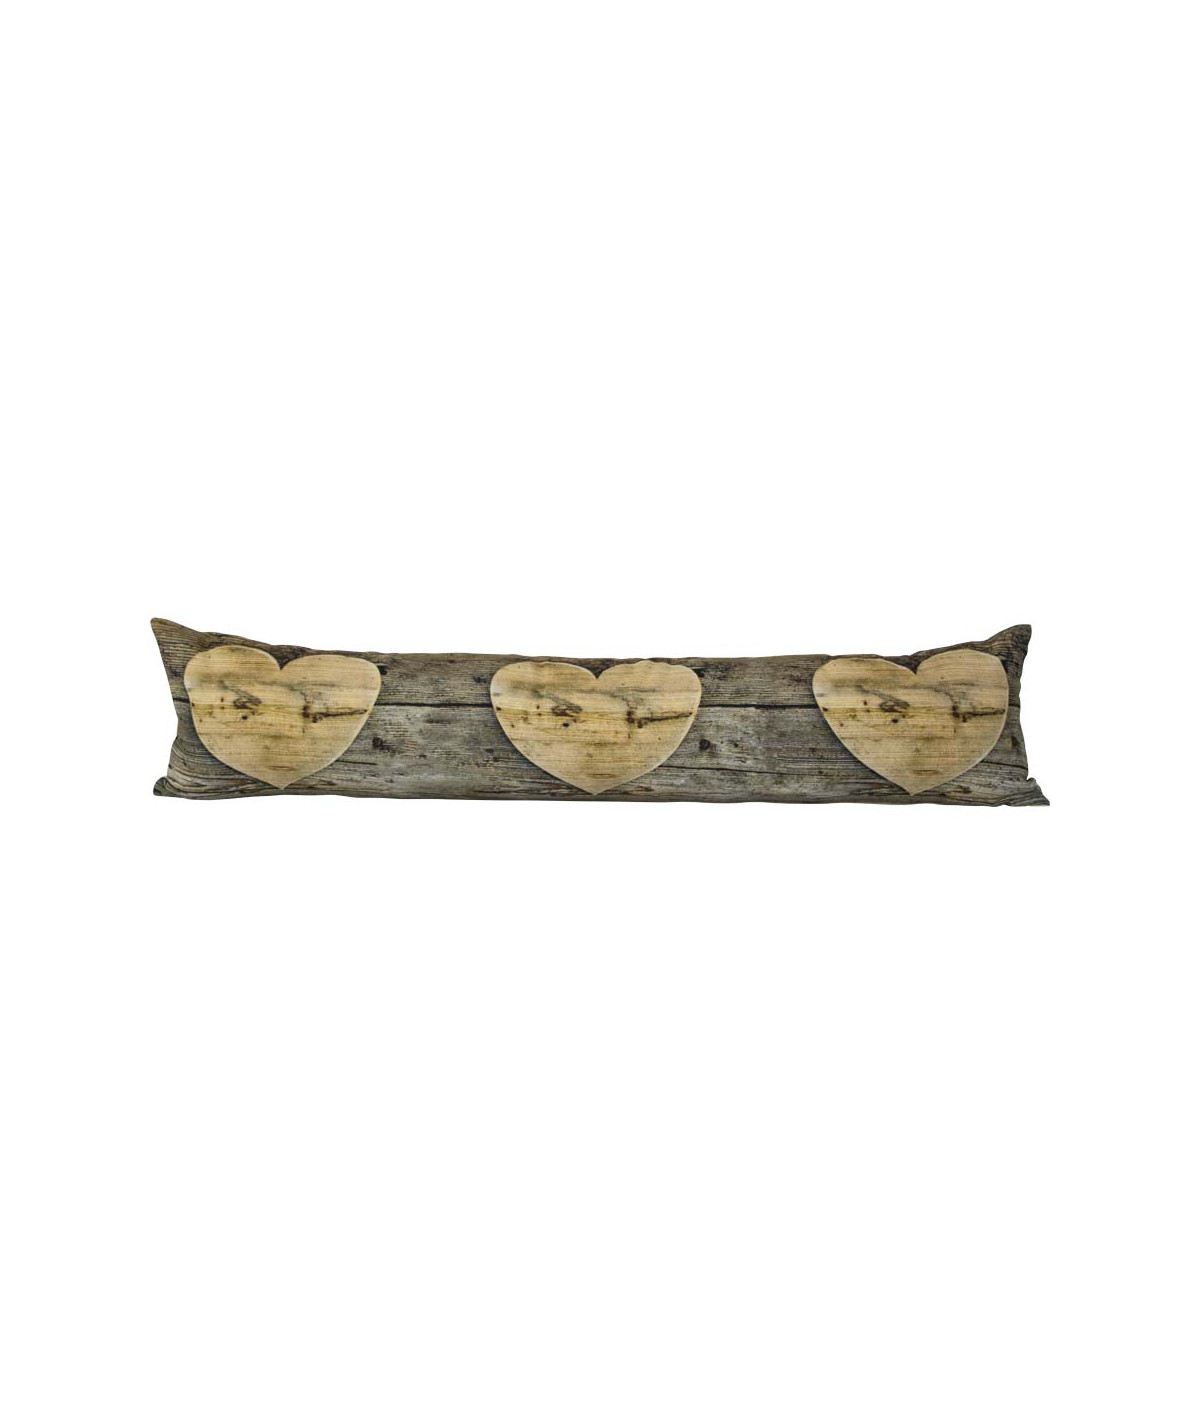 Boudin de porte en coton motif bois 90x20cm - Coeur |YESDEKO